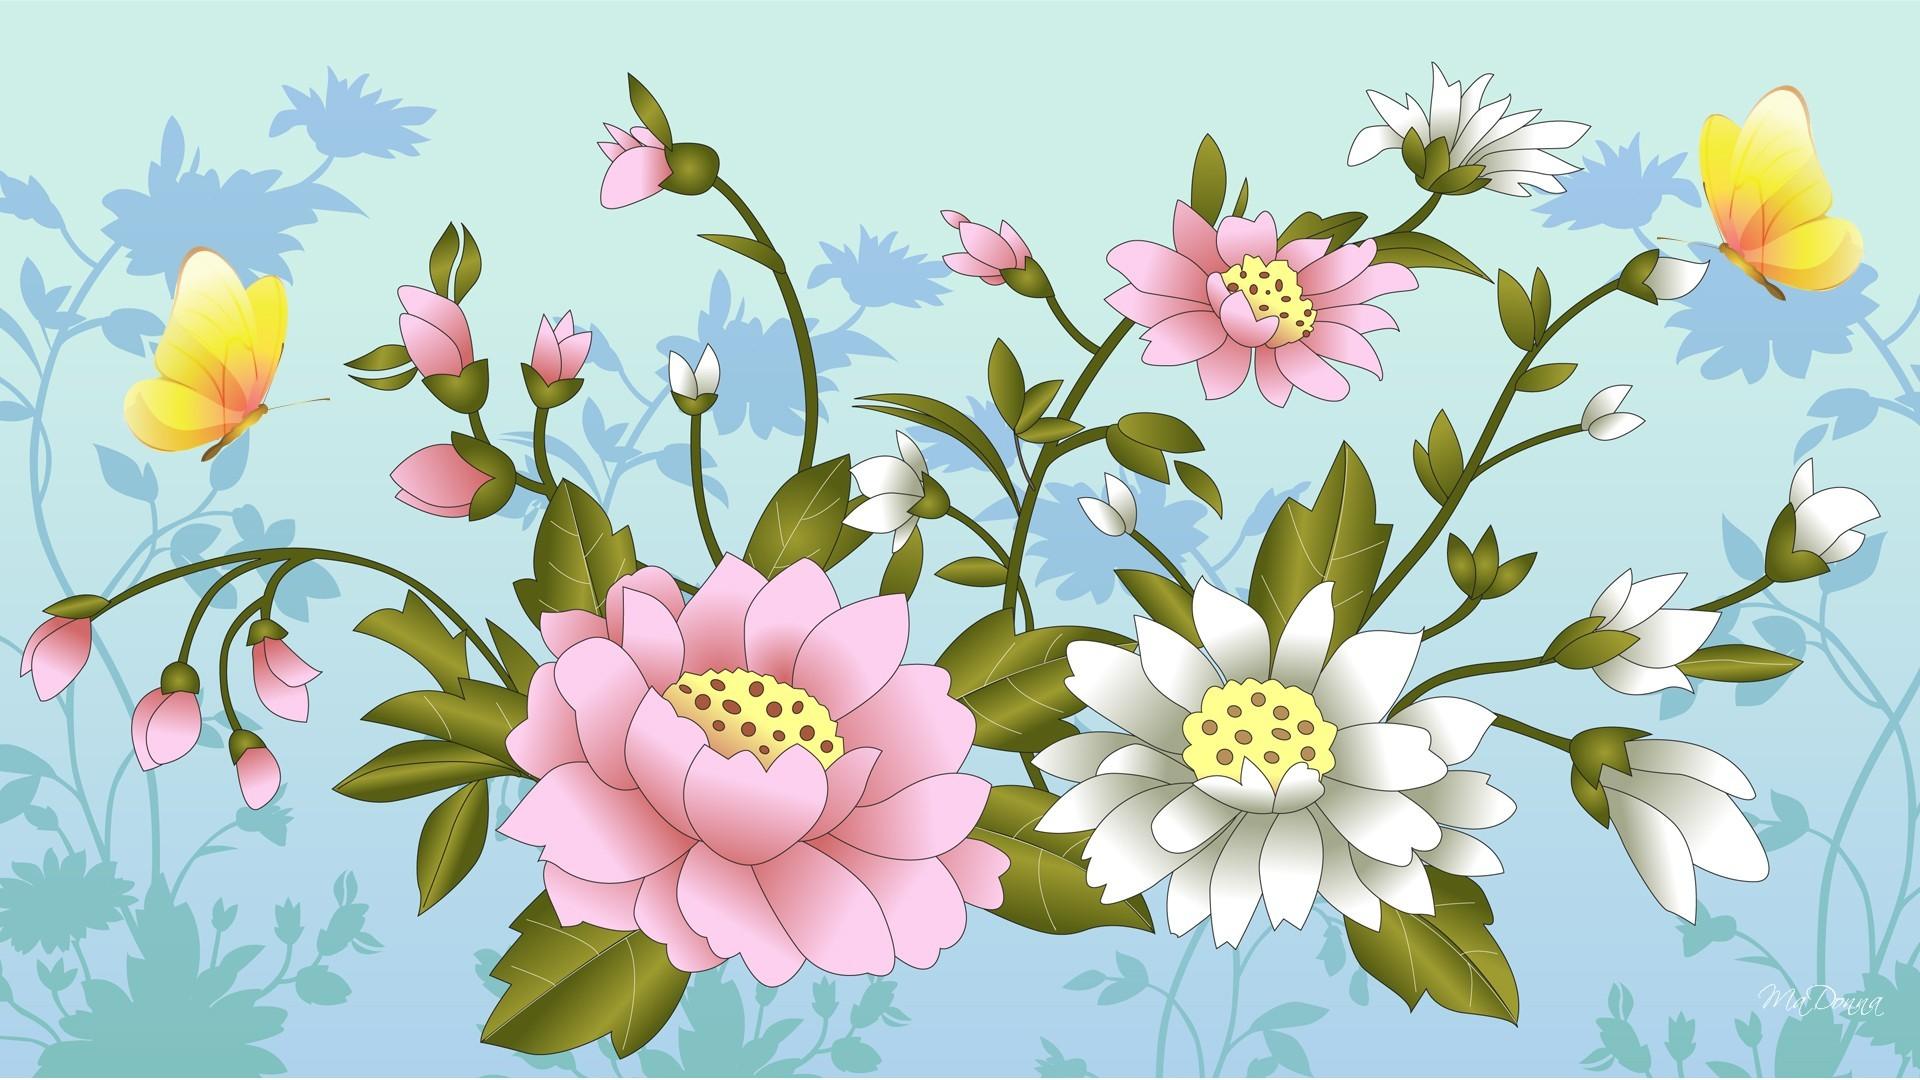 Women's Day Vector Flowers wallpaper